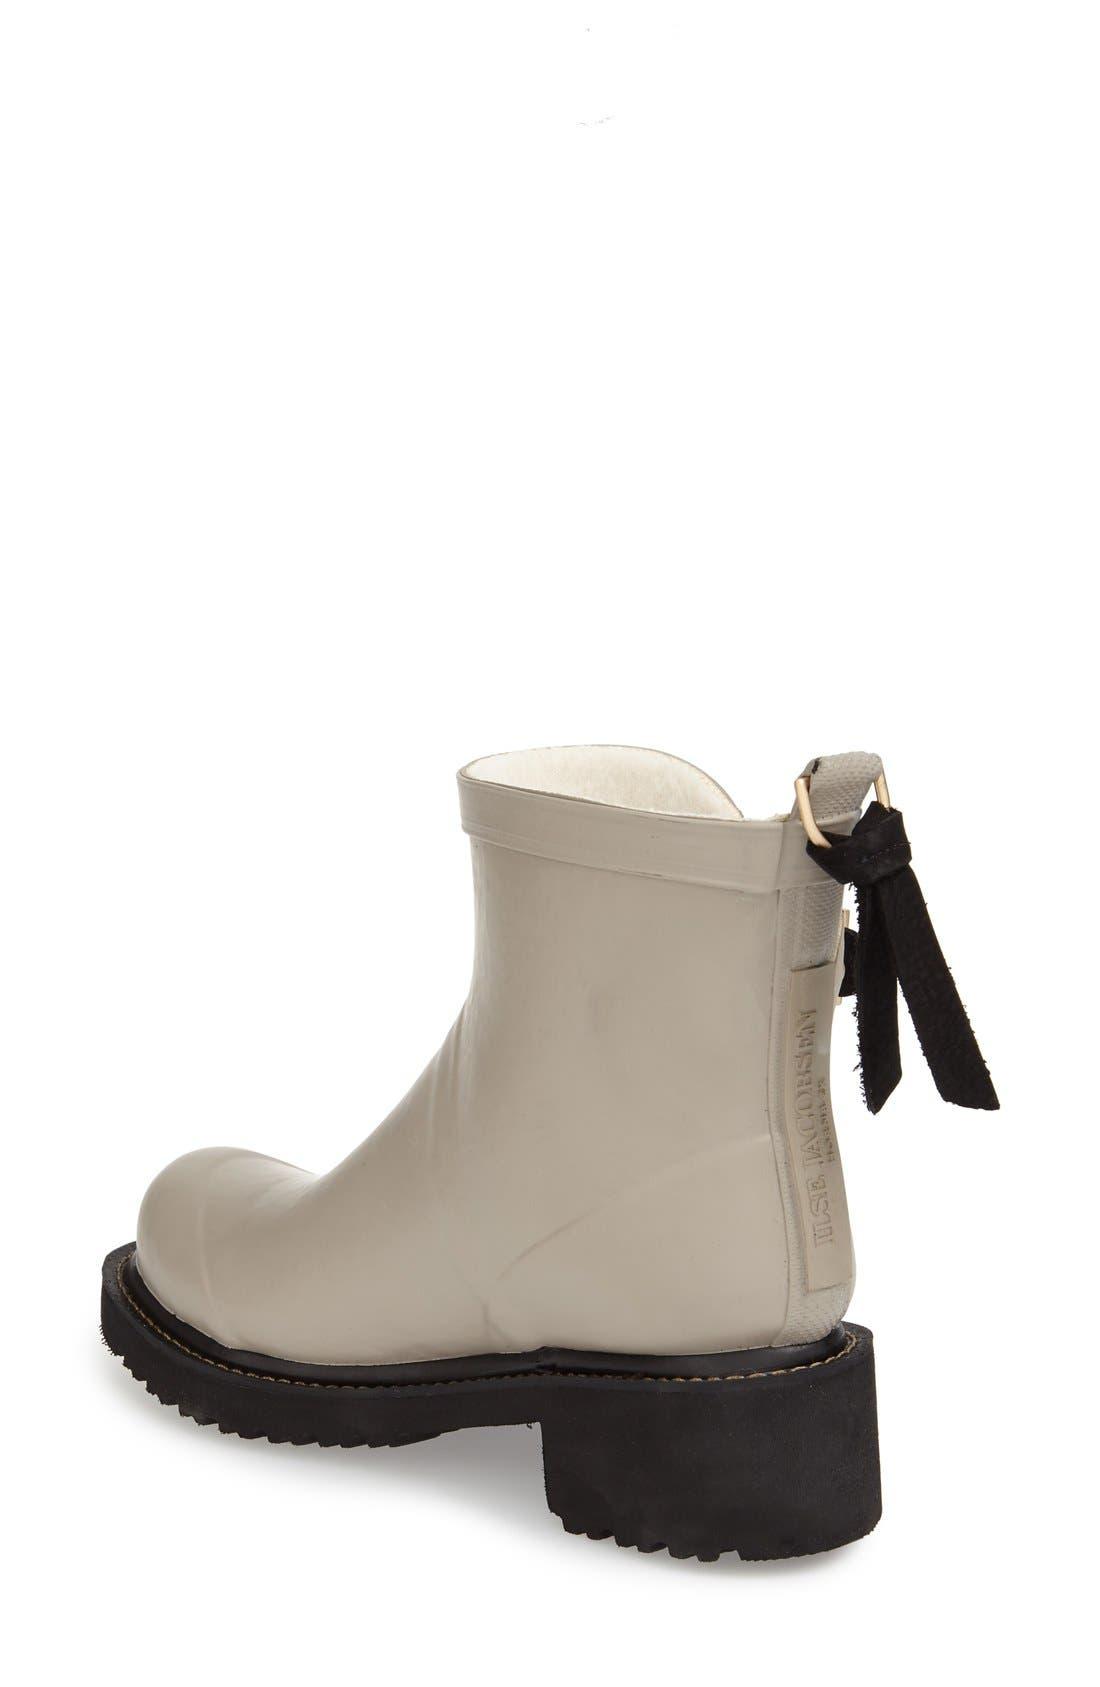 Short Waterproof Rubber Boot,                             Alternate thumbnail 2, color,                             ATMOSPHERE